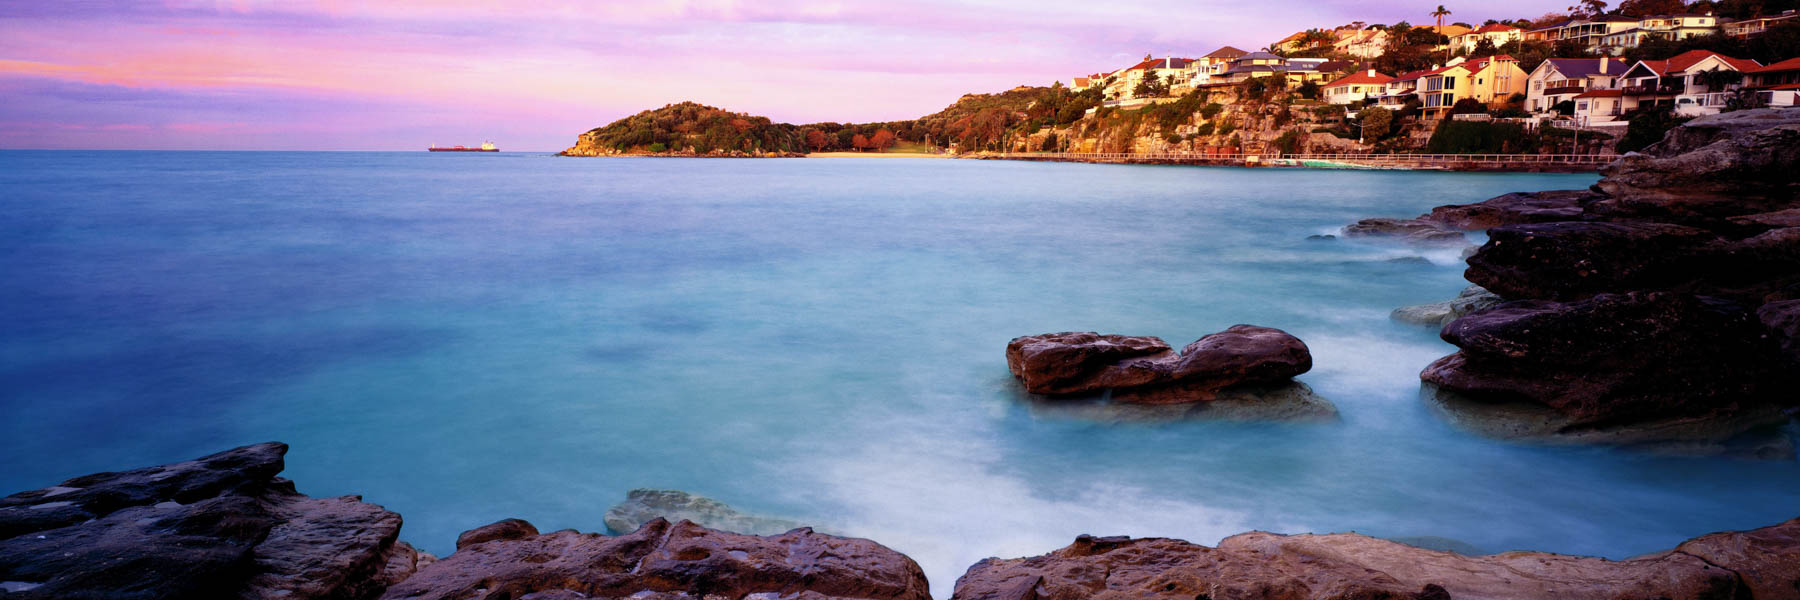 Sunrise over Cabbage Tree Bay, Sydney, NSW, Australia.